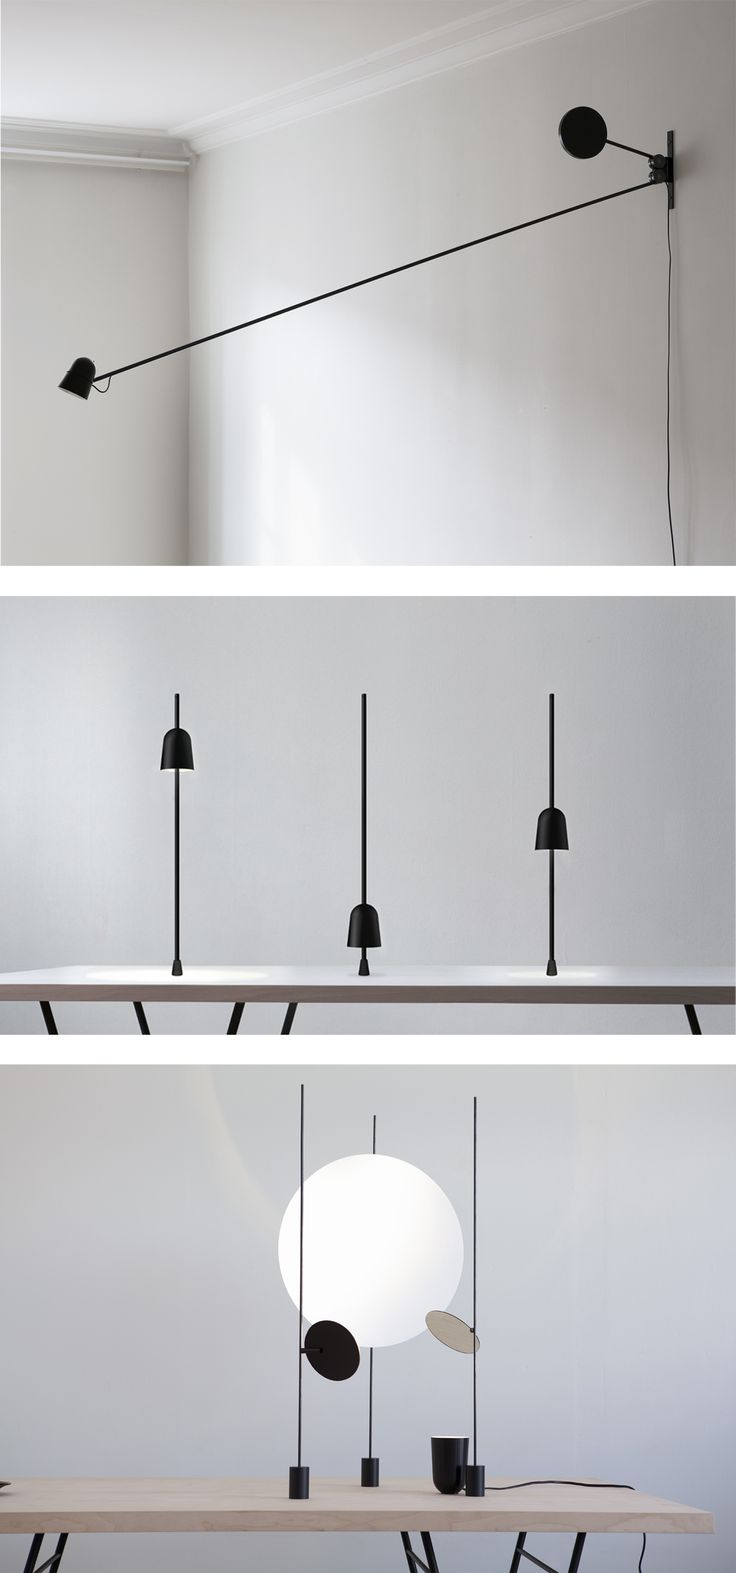 Light work by Daniel Rybakken